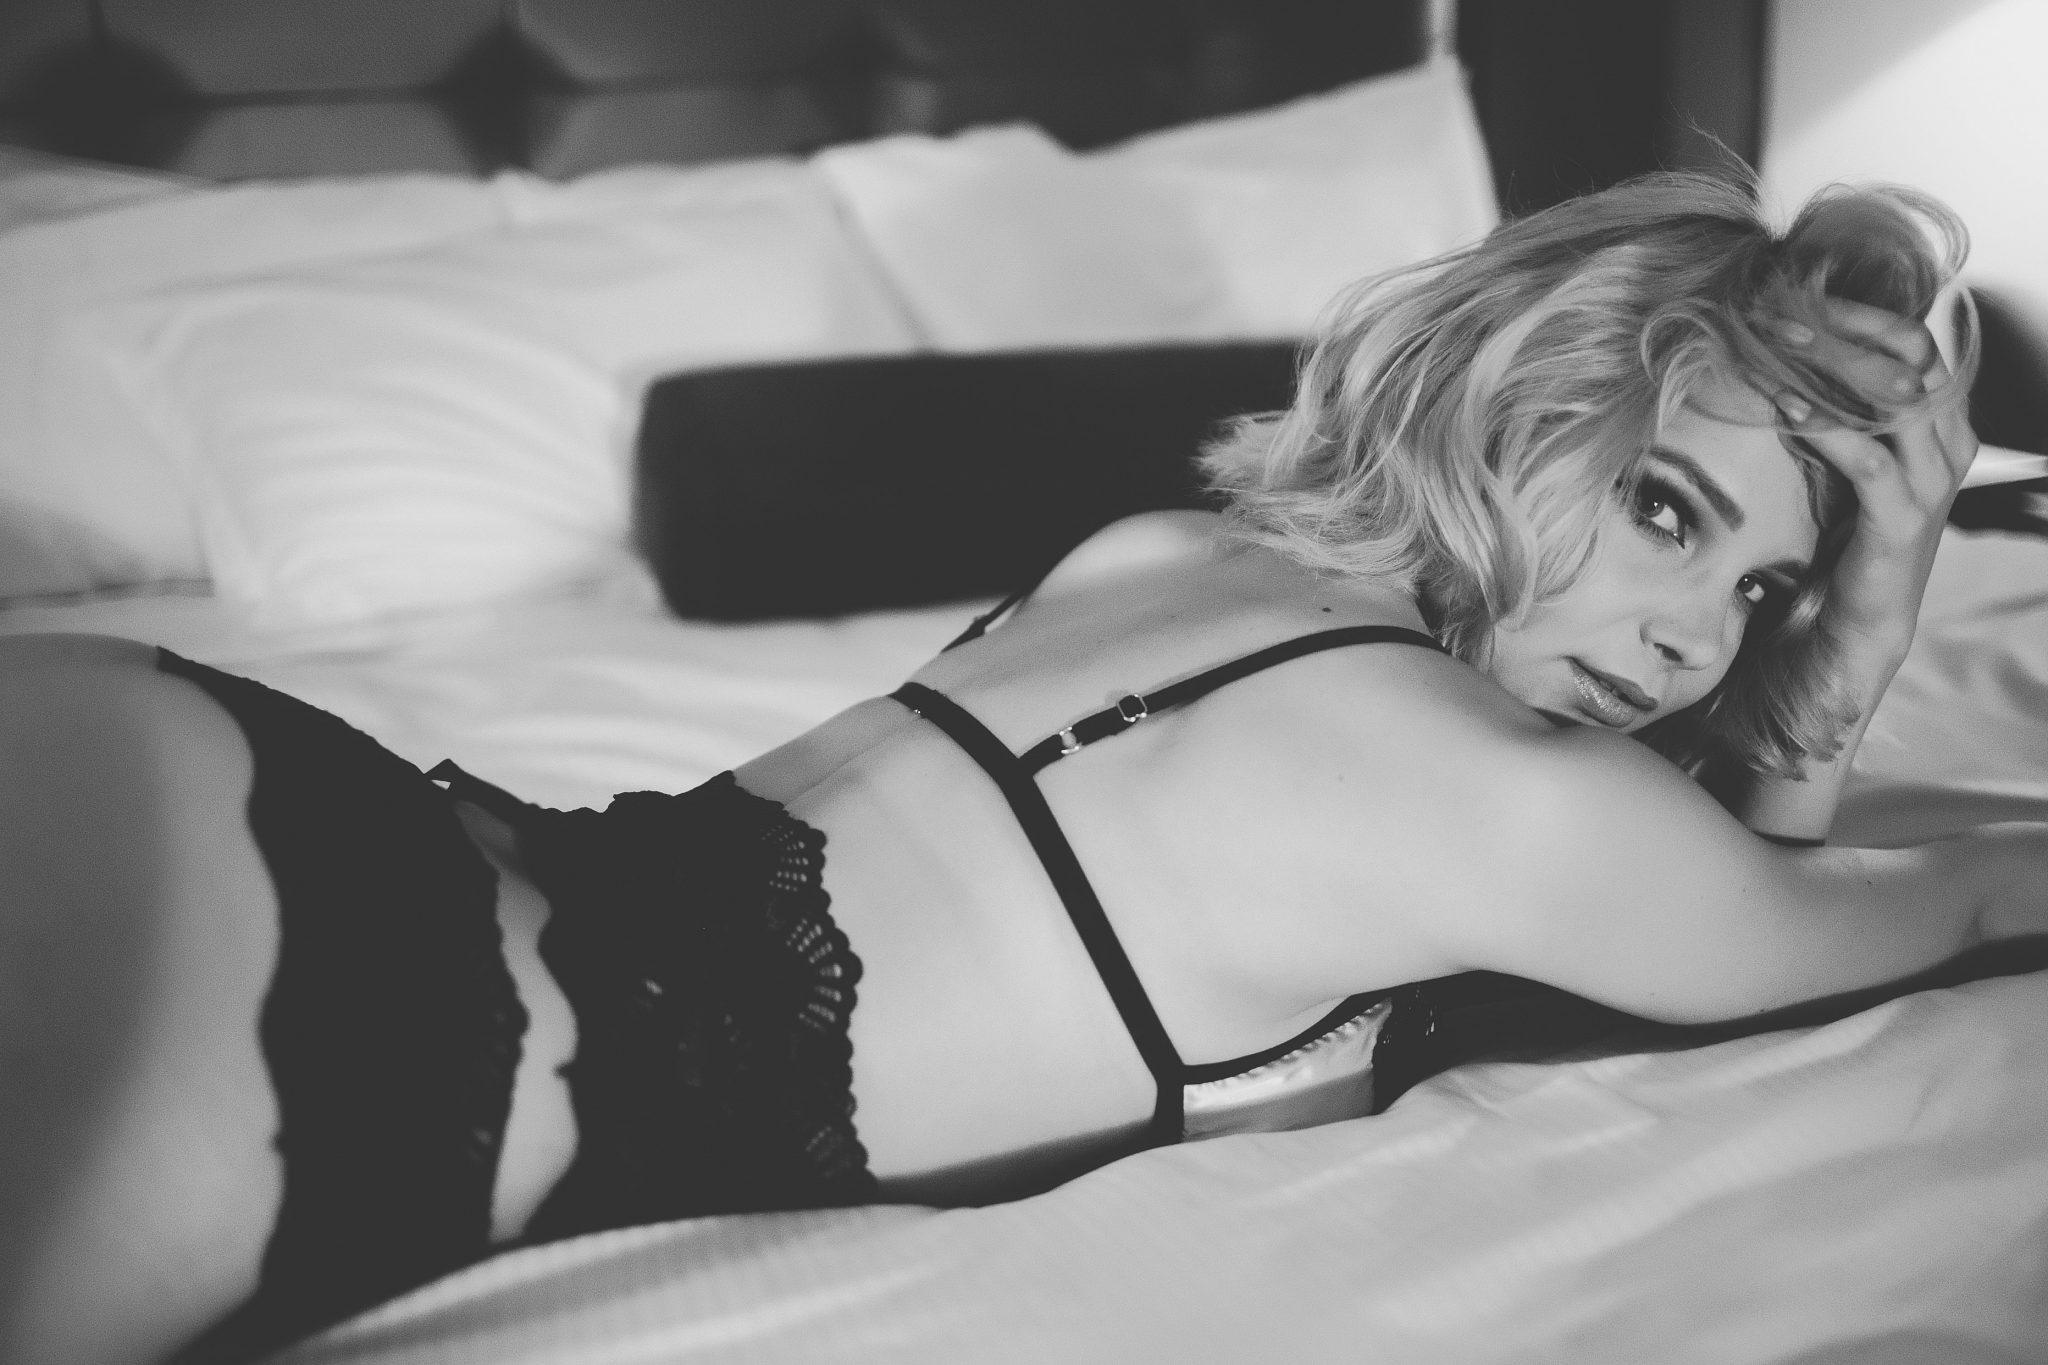 Sexy photograph of a beautiful woman